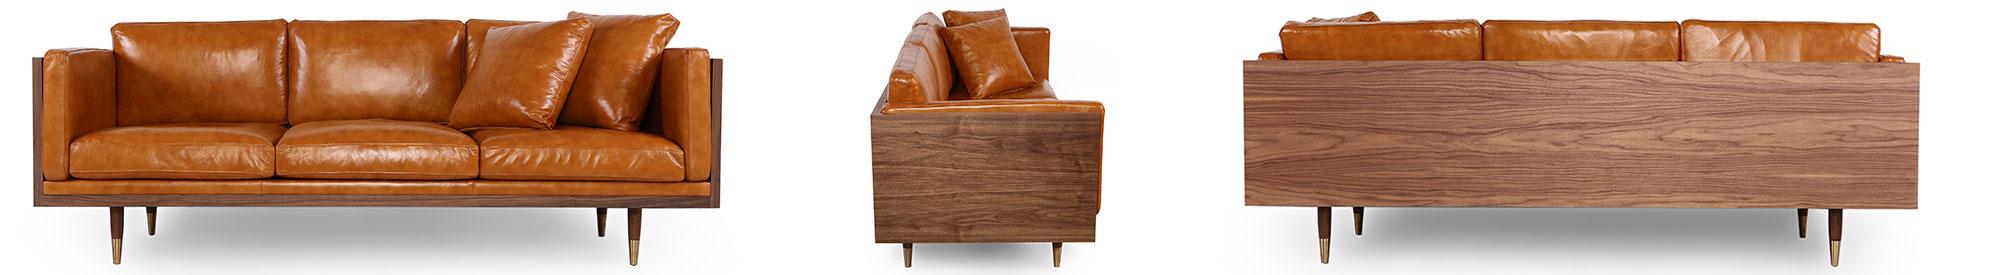 woodrow series